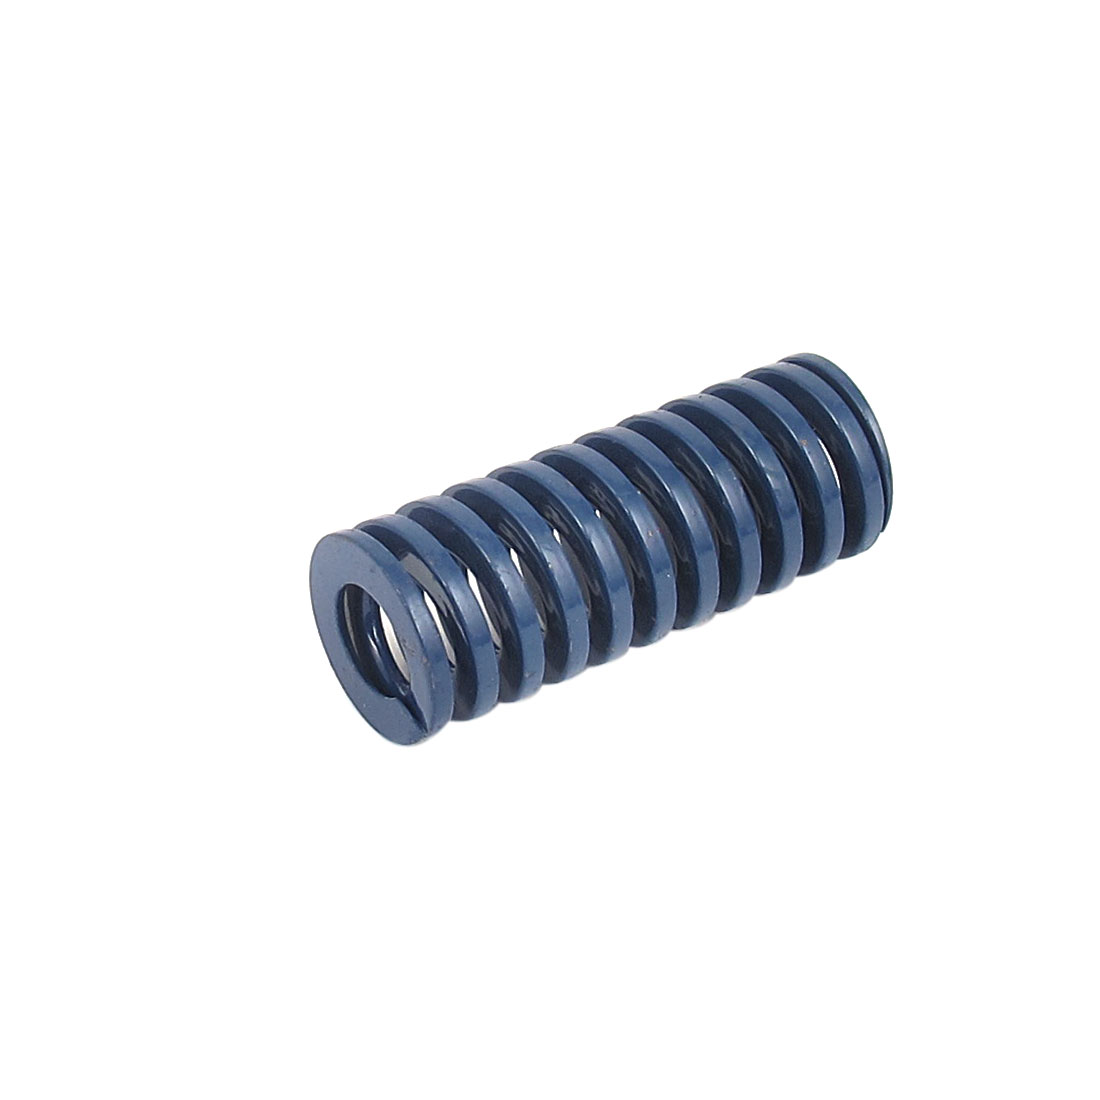 22mmx55mm Chromium Alloy Steel Light Load Die Spring Blue